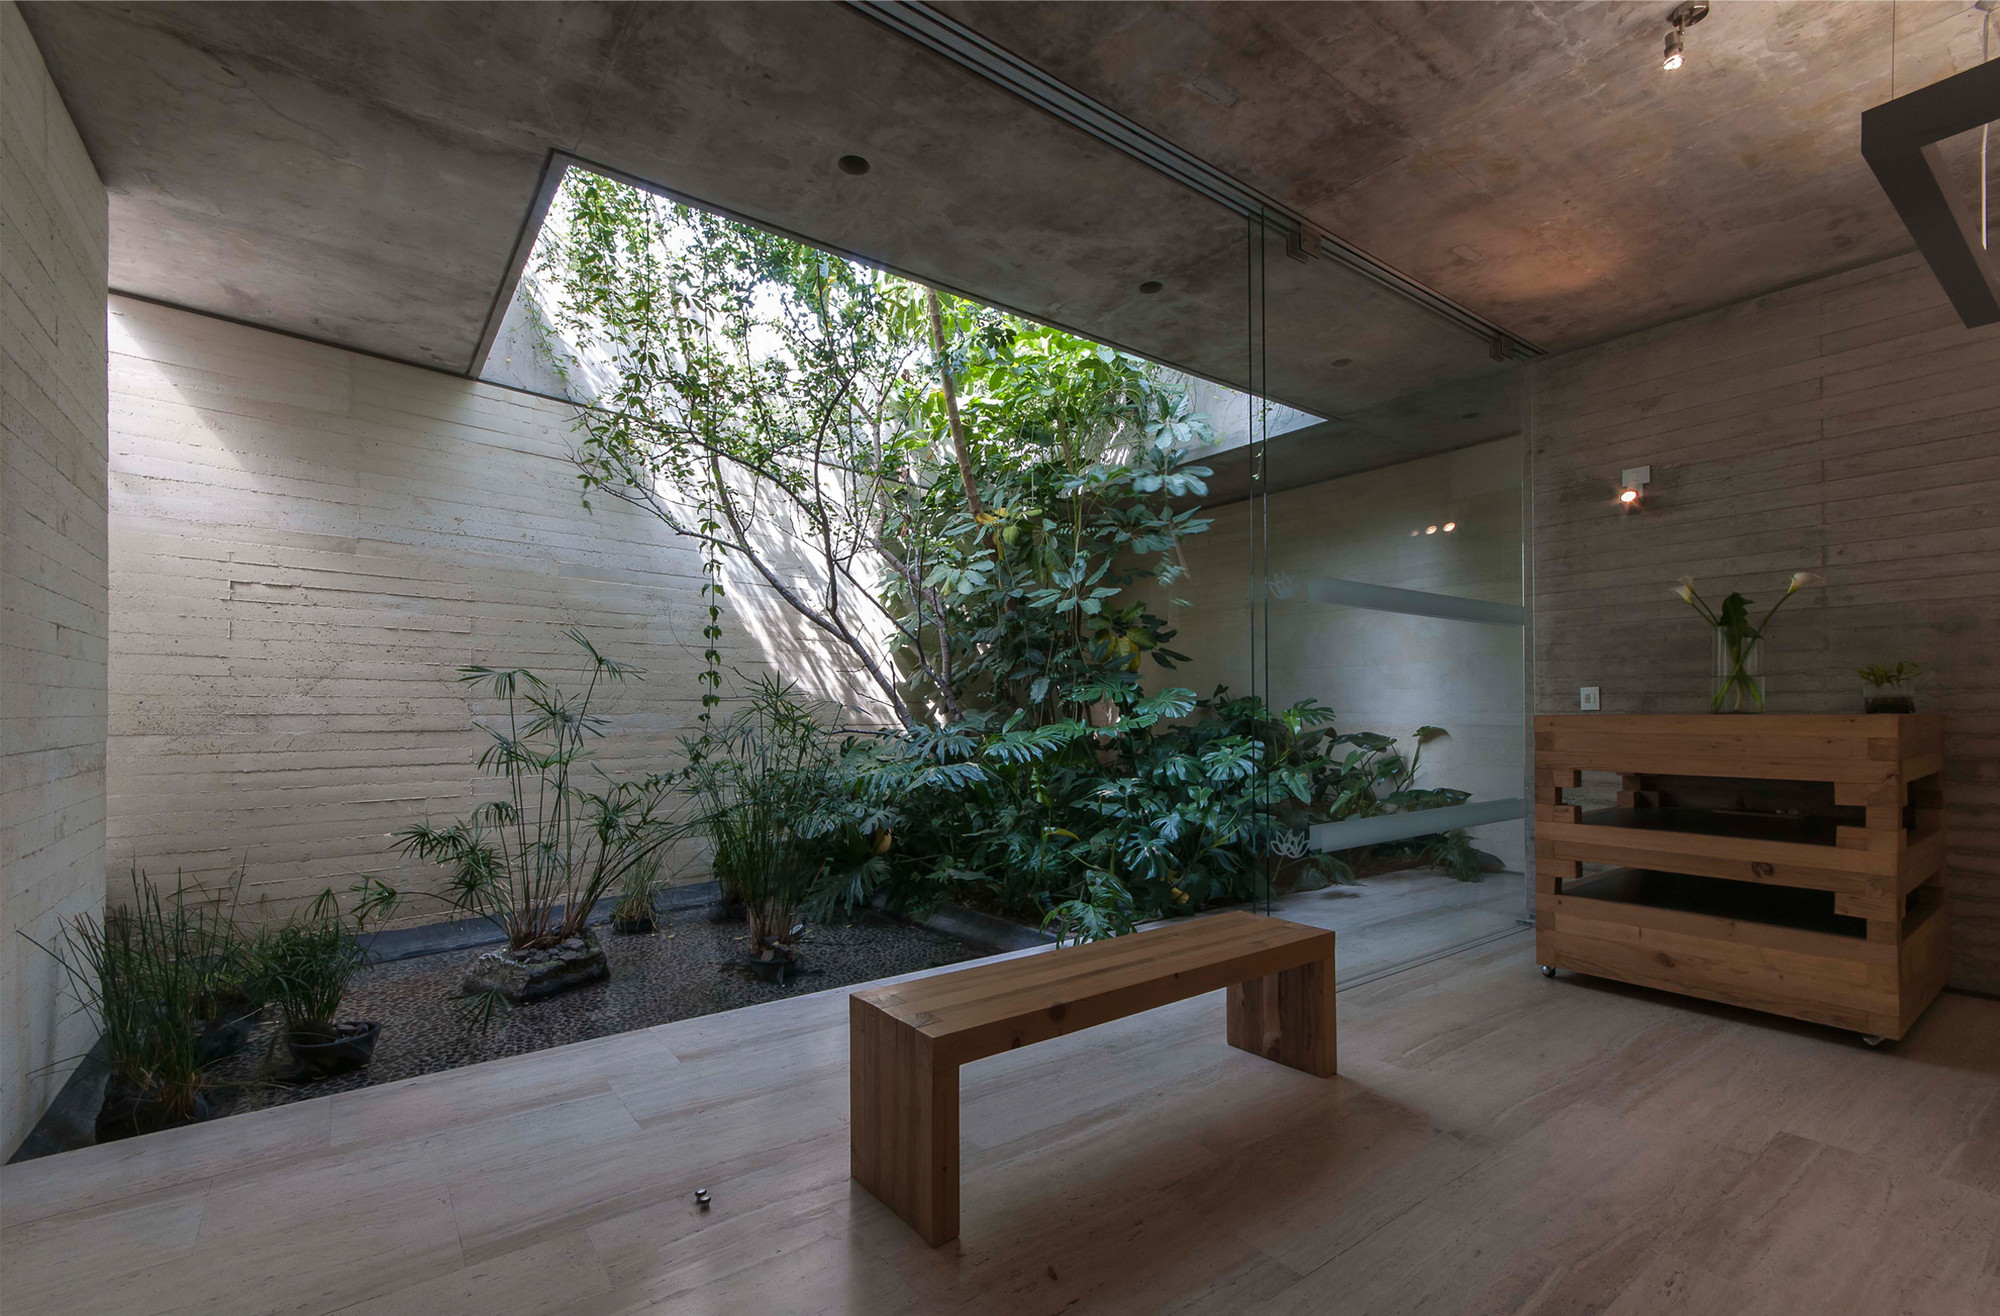 Gallery of spa quer taro ambrosi i etchegaray 9 for Jardines de interior